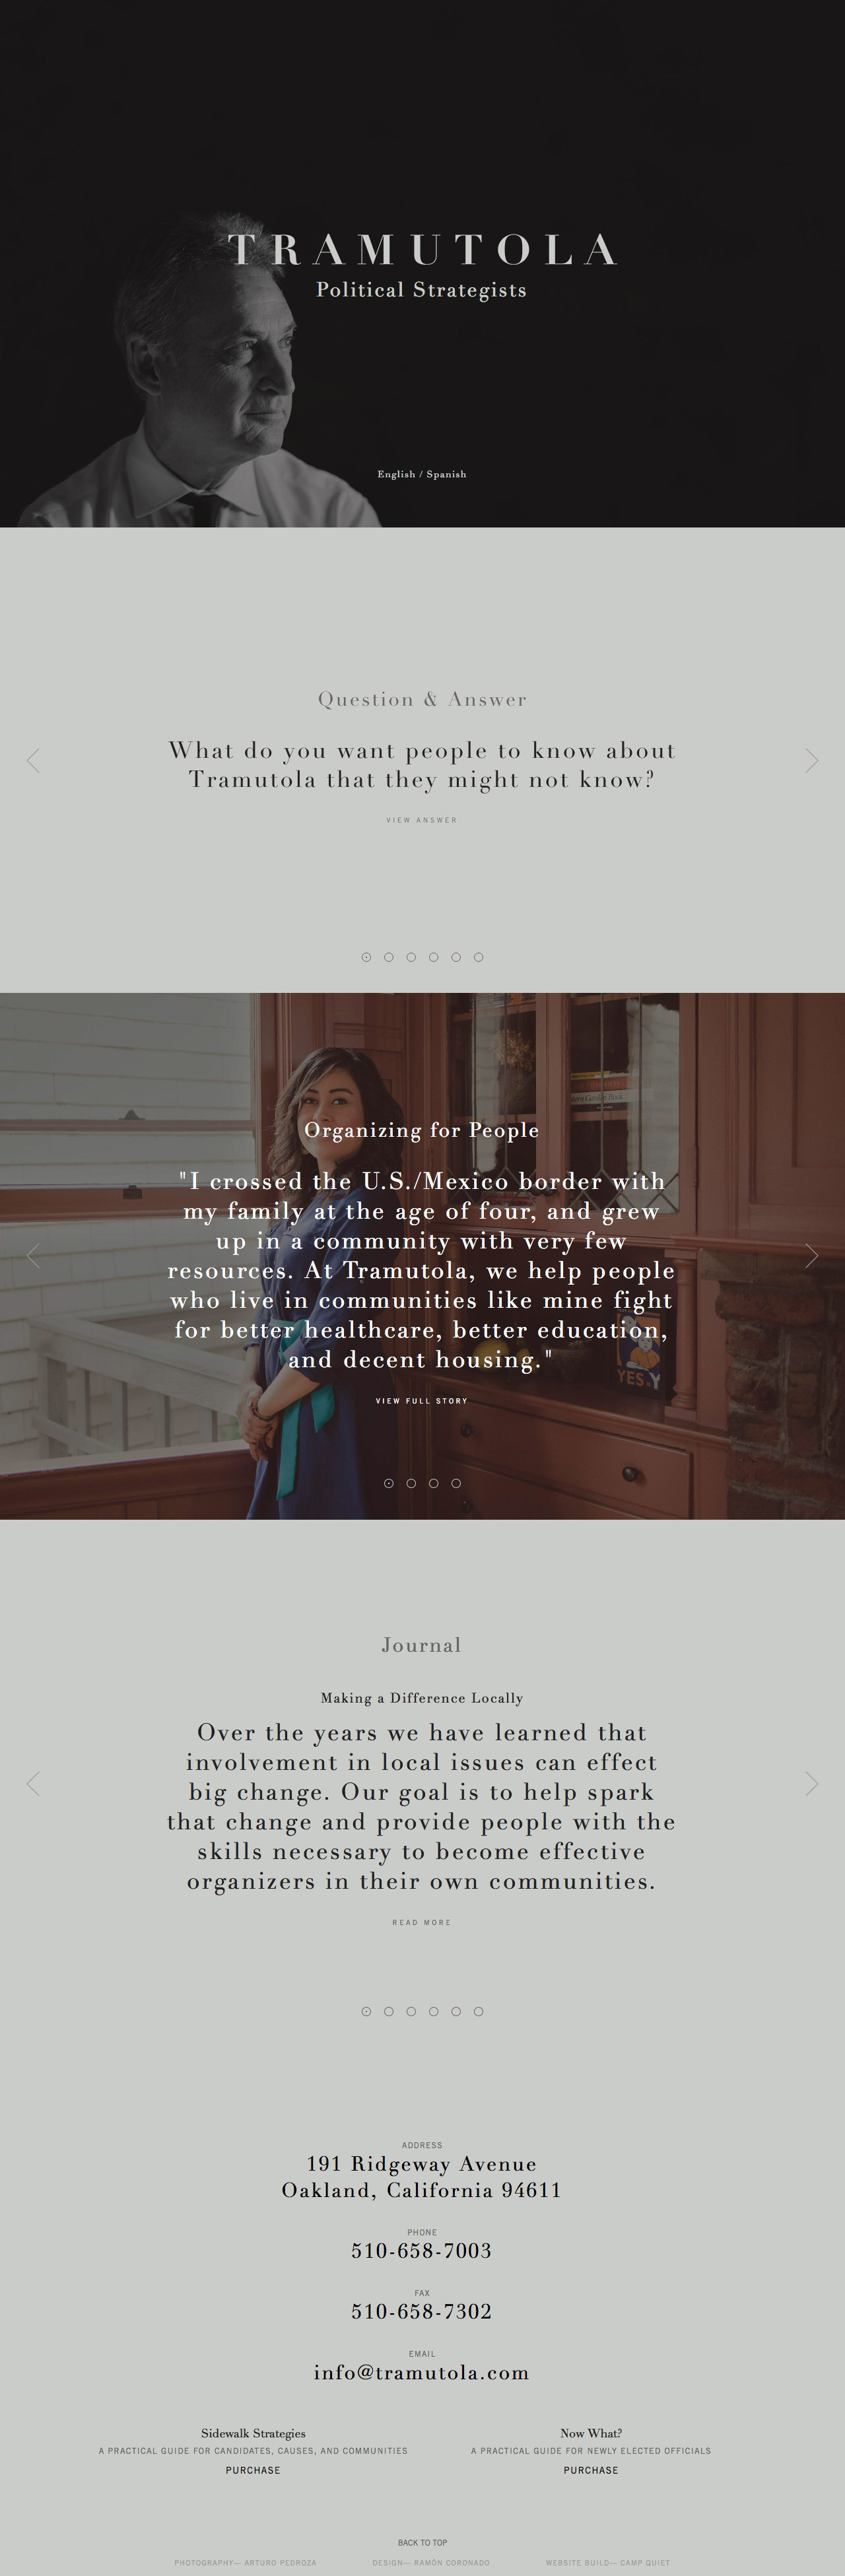 Tramutola Website Screenshot